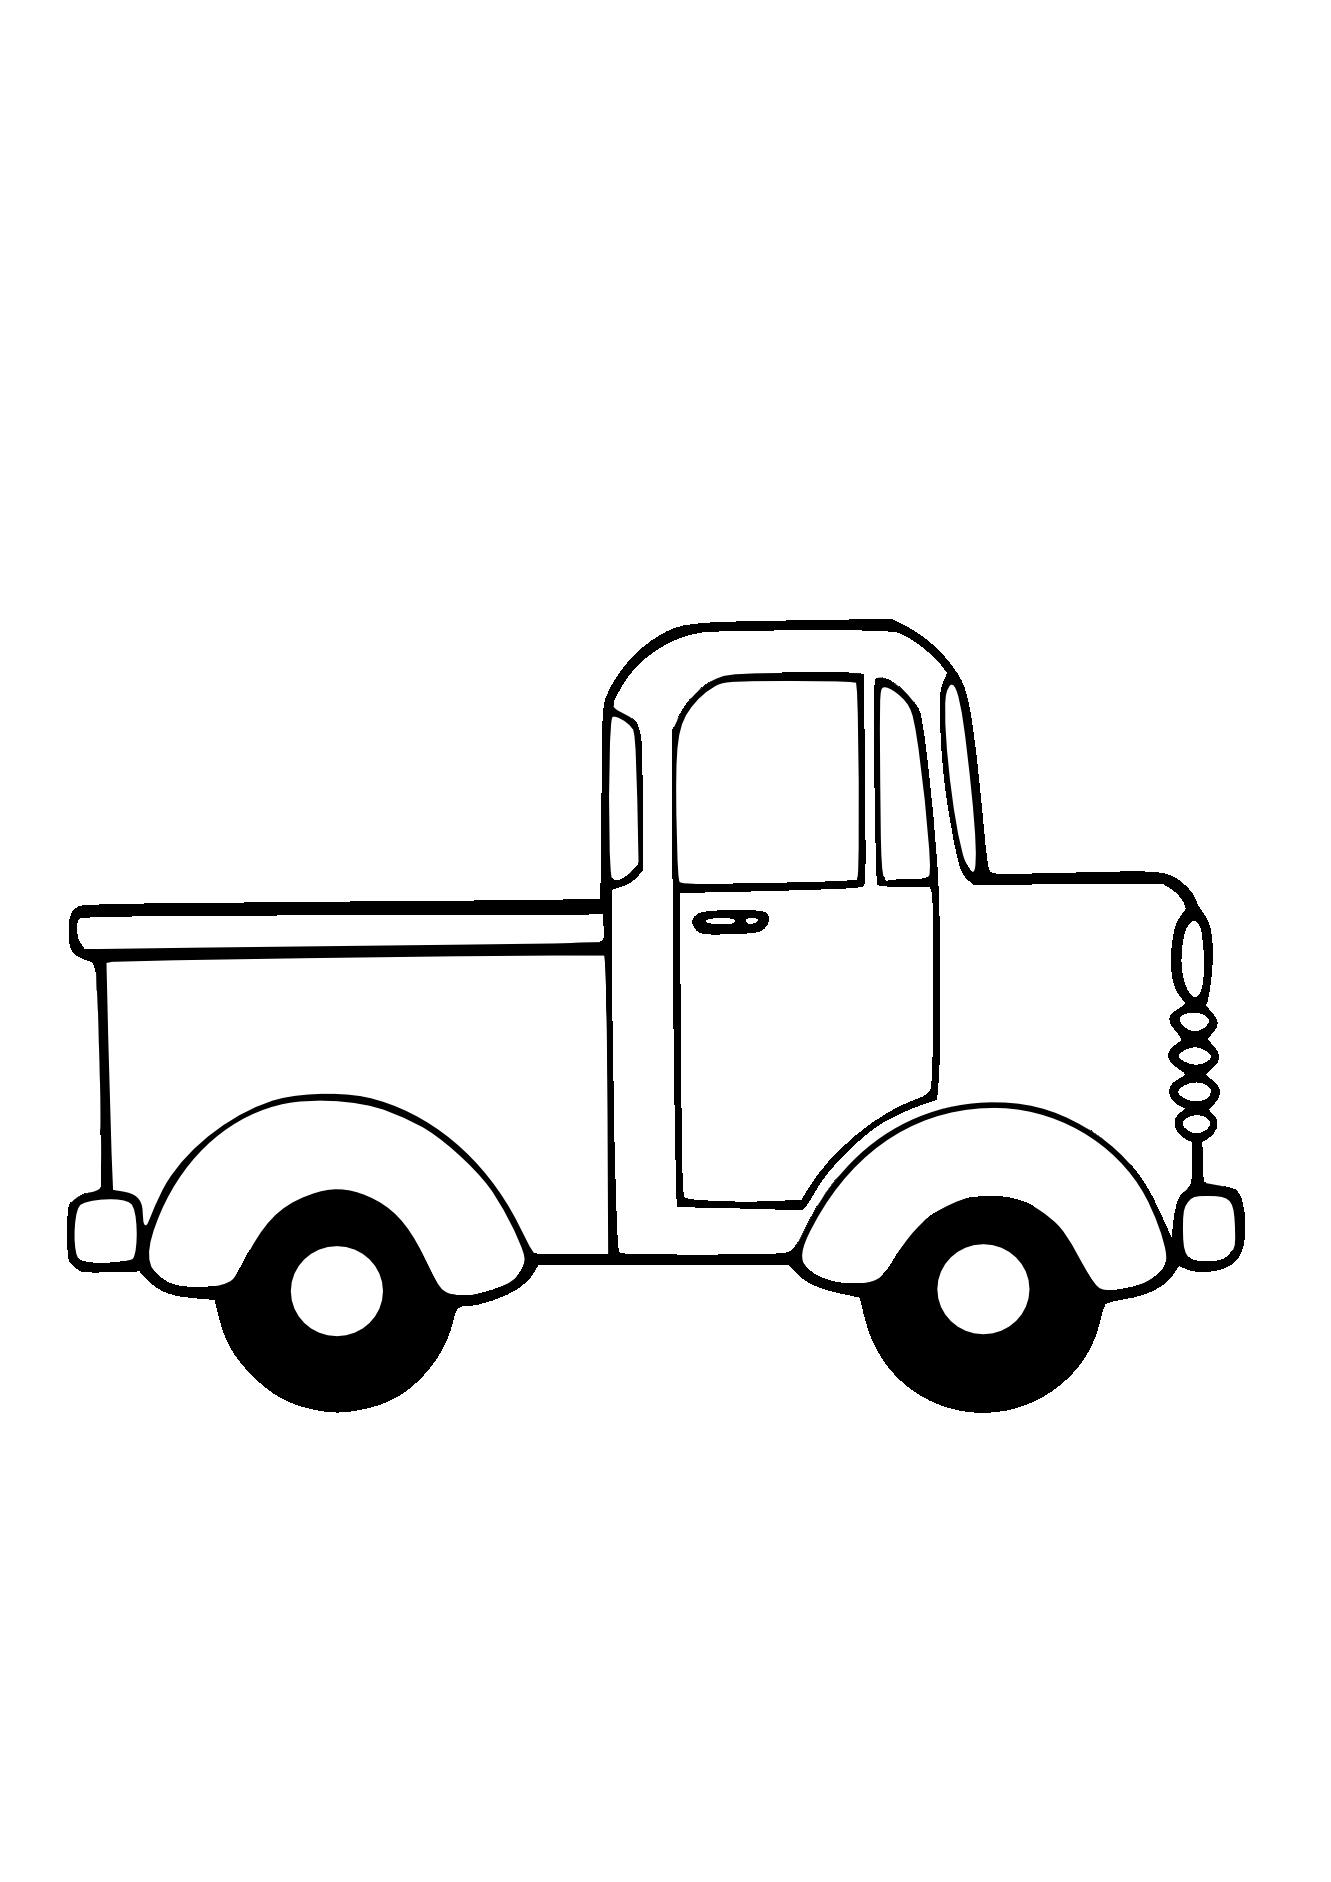 Car radio clipart black and white vector royalty free Truck Black White Line Art Christmas Xmas Toy Scalable Vector ... vector royalty free